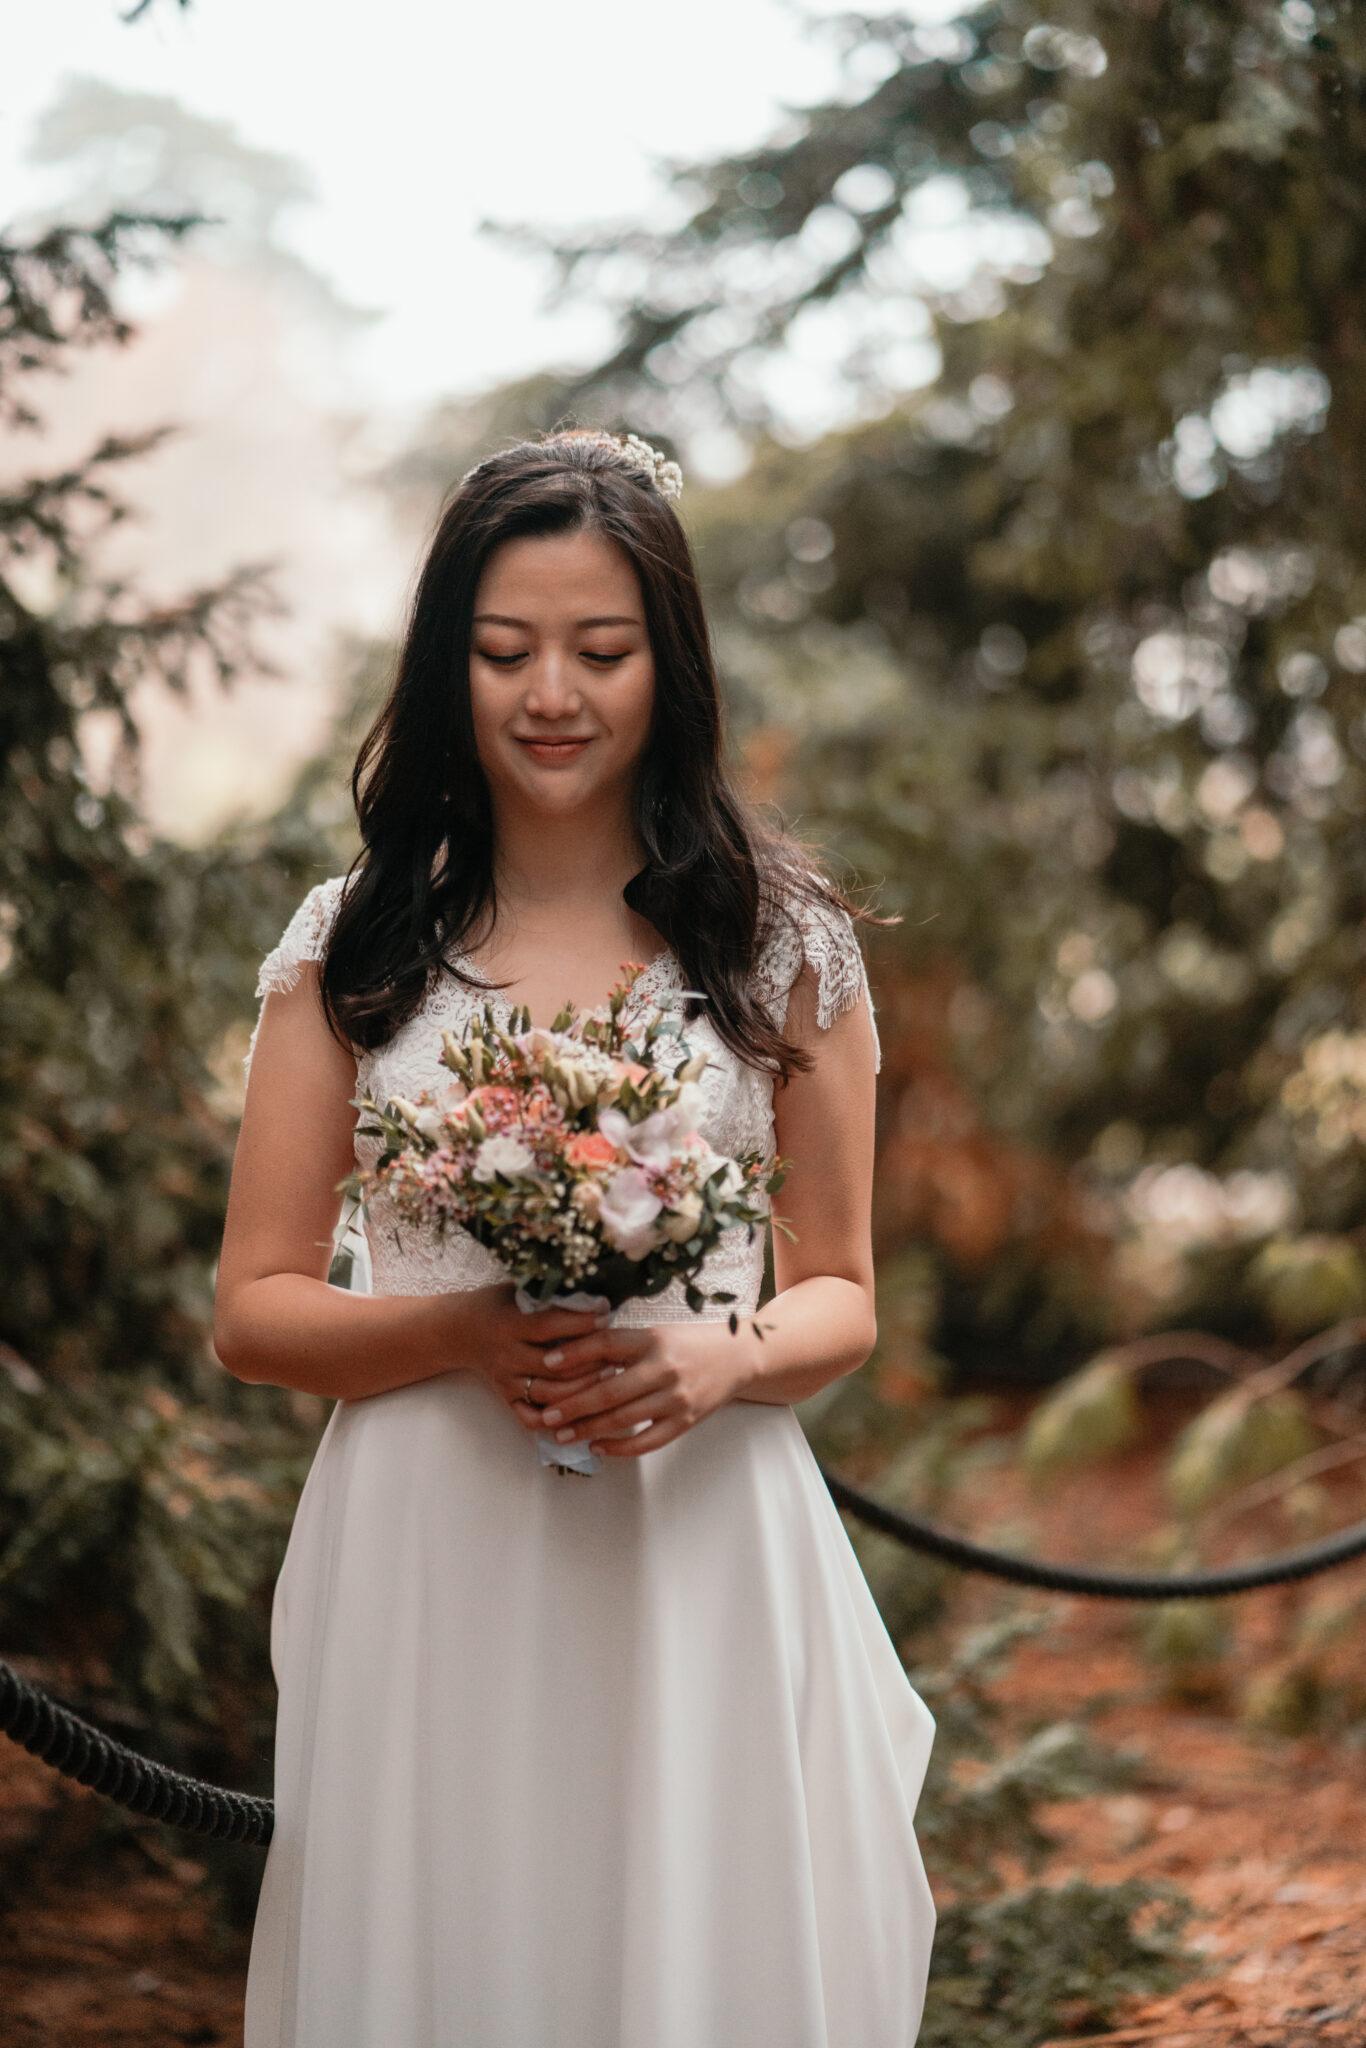 Hochzeitsfotograf fotografiert Braut